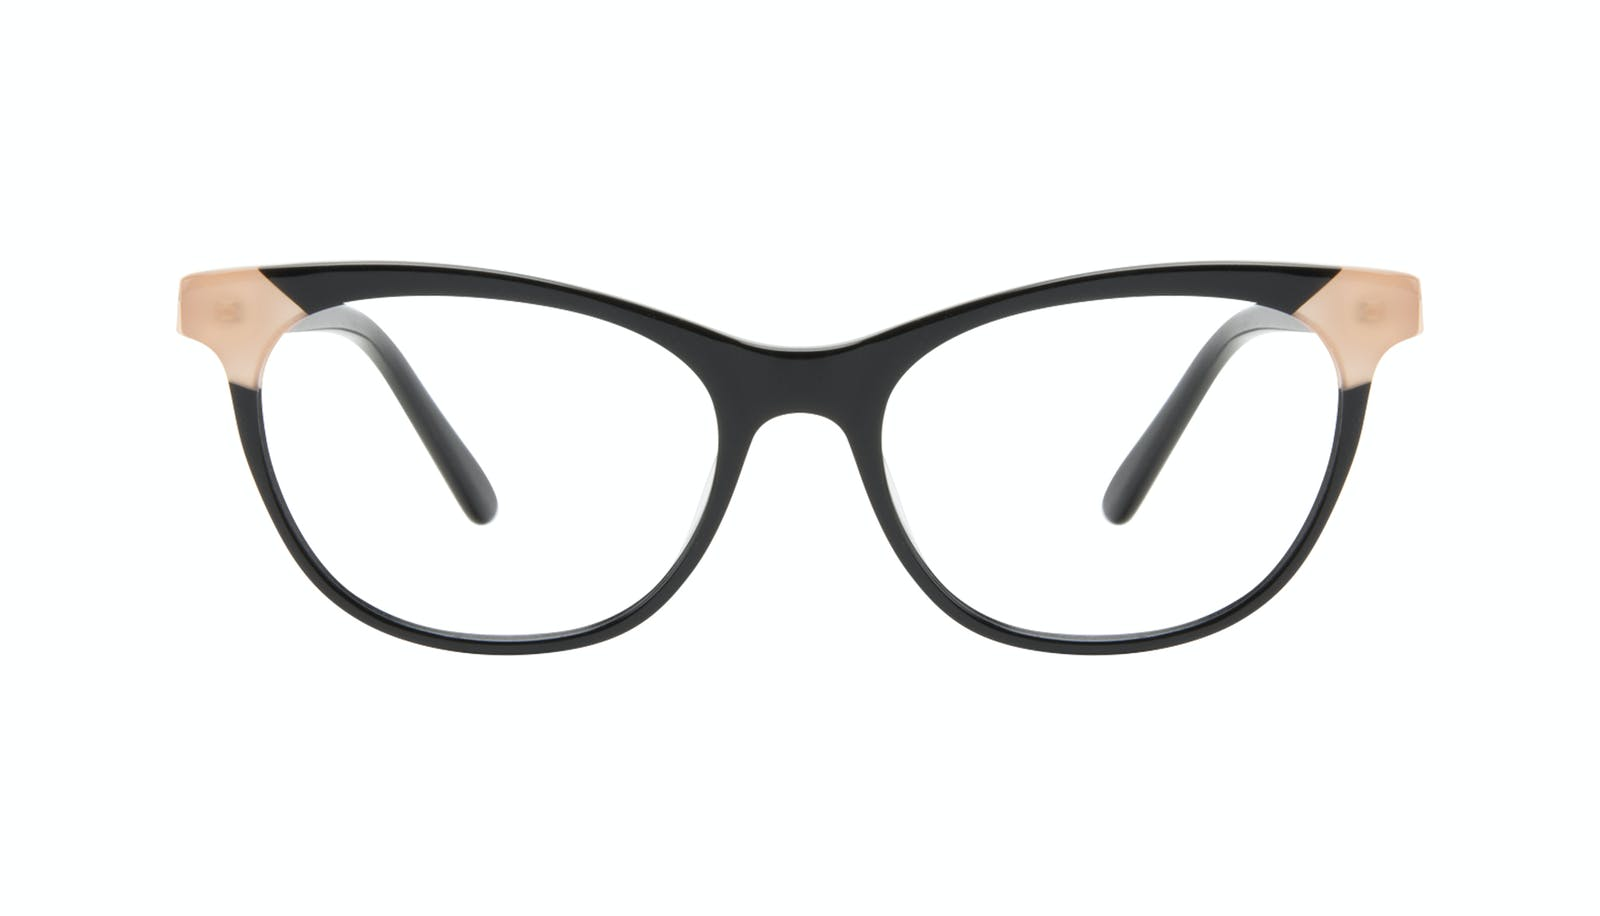 8d279a34406 Affordable Fashion Glasses Cat Eye Eyeglasses Women Witty Black Ivory